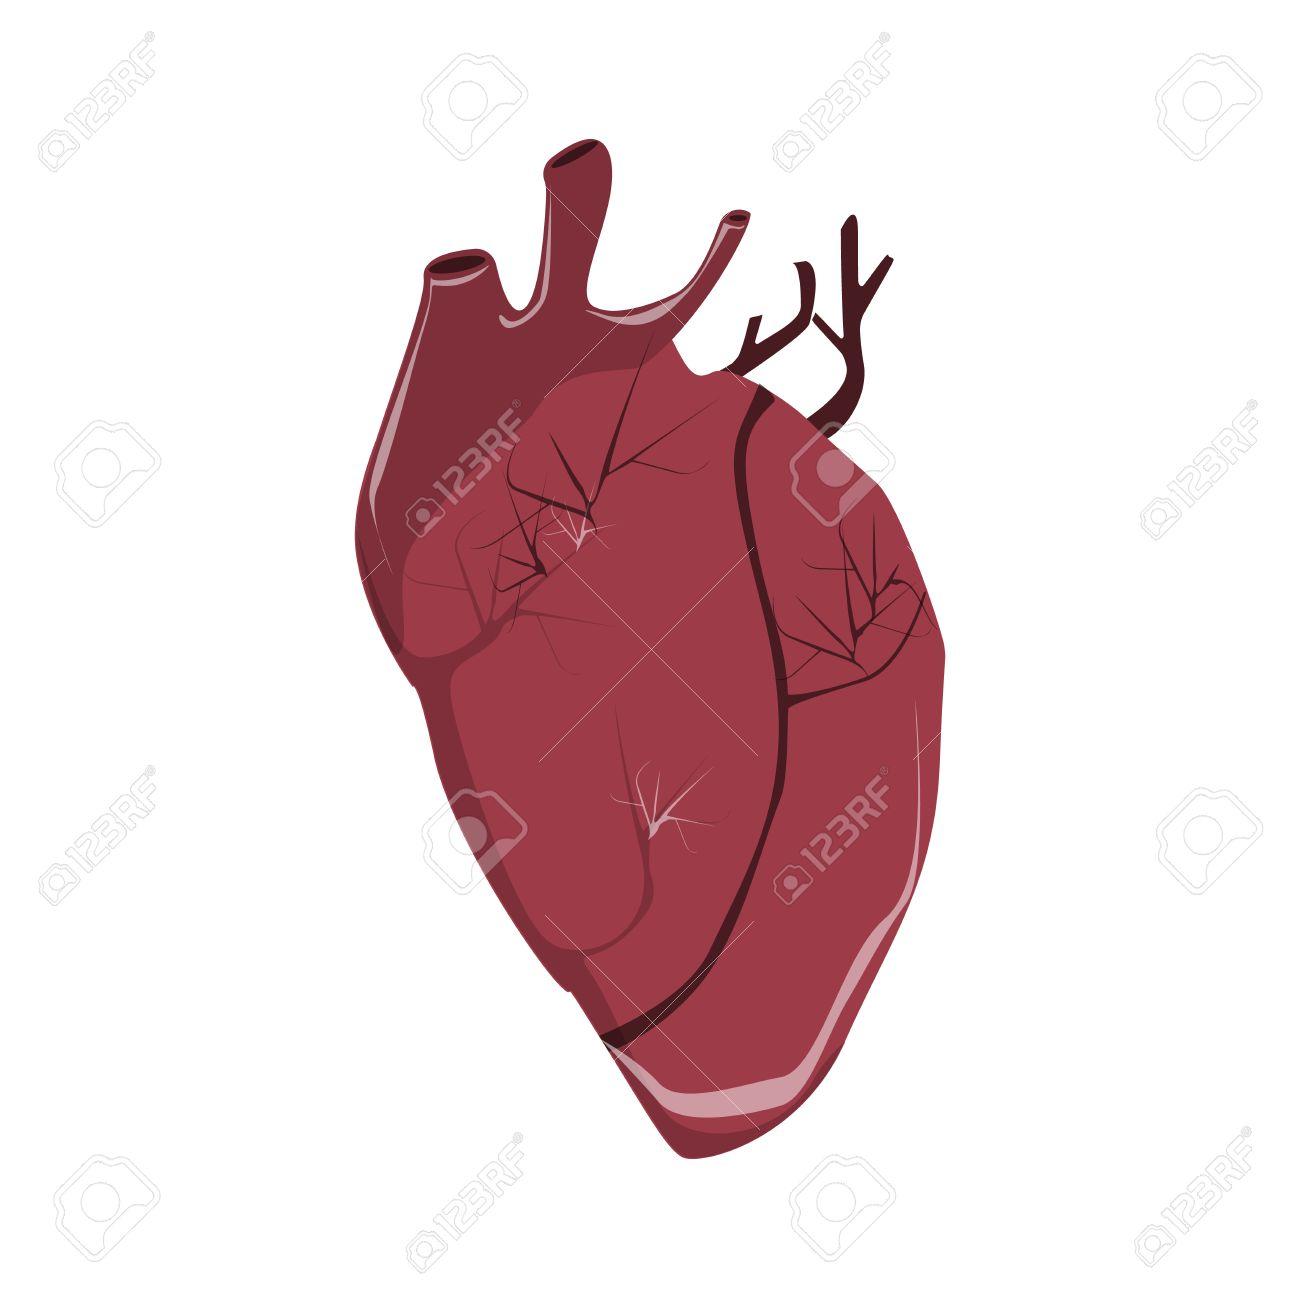 Aislado Corazón Humano Realista Sobre Fondo Blanco. Anatomía Humana ...